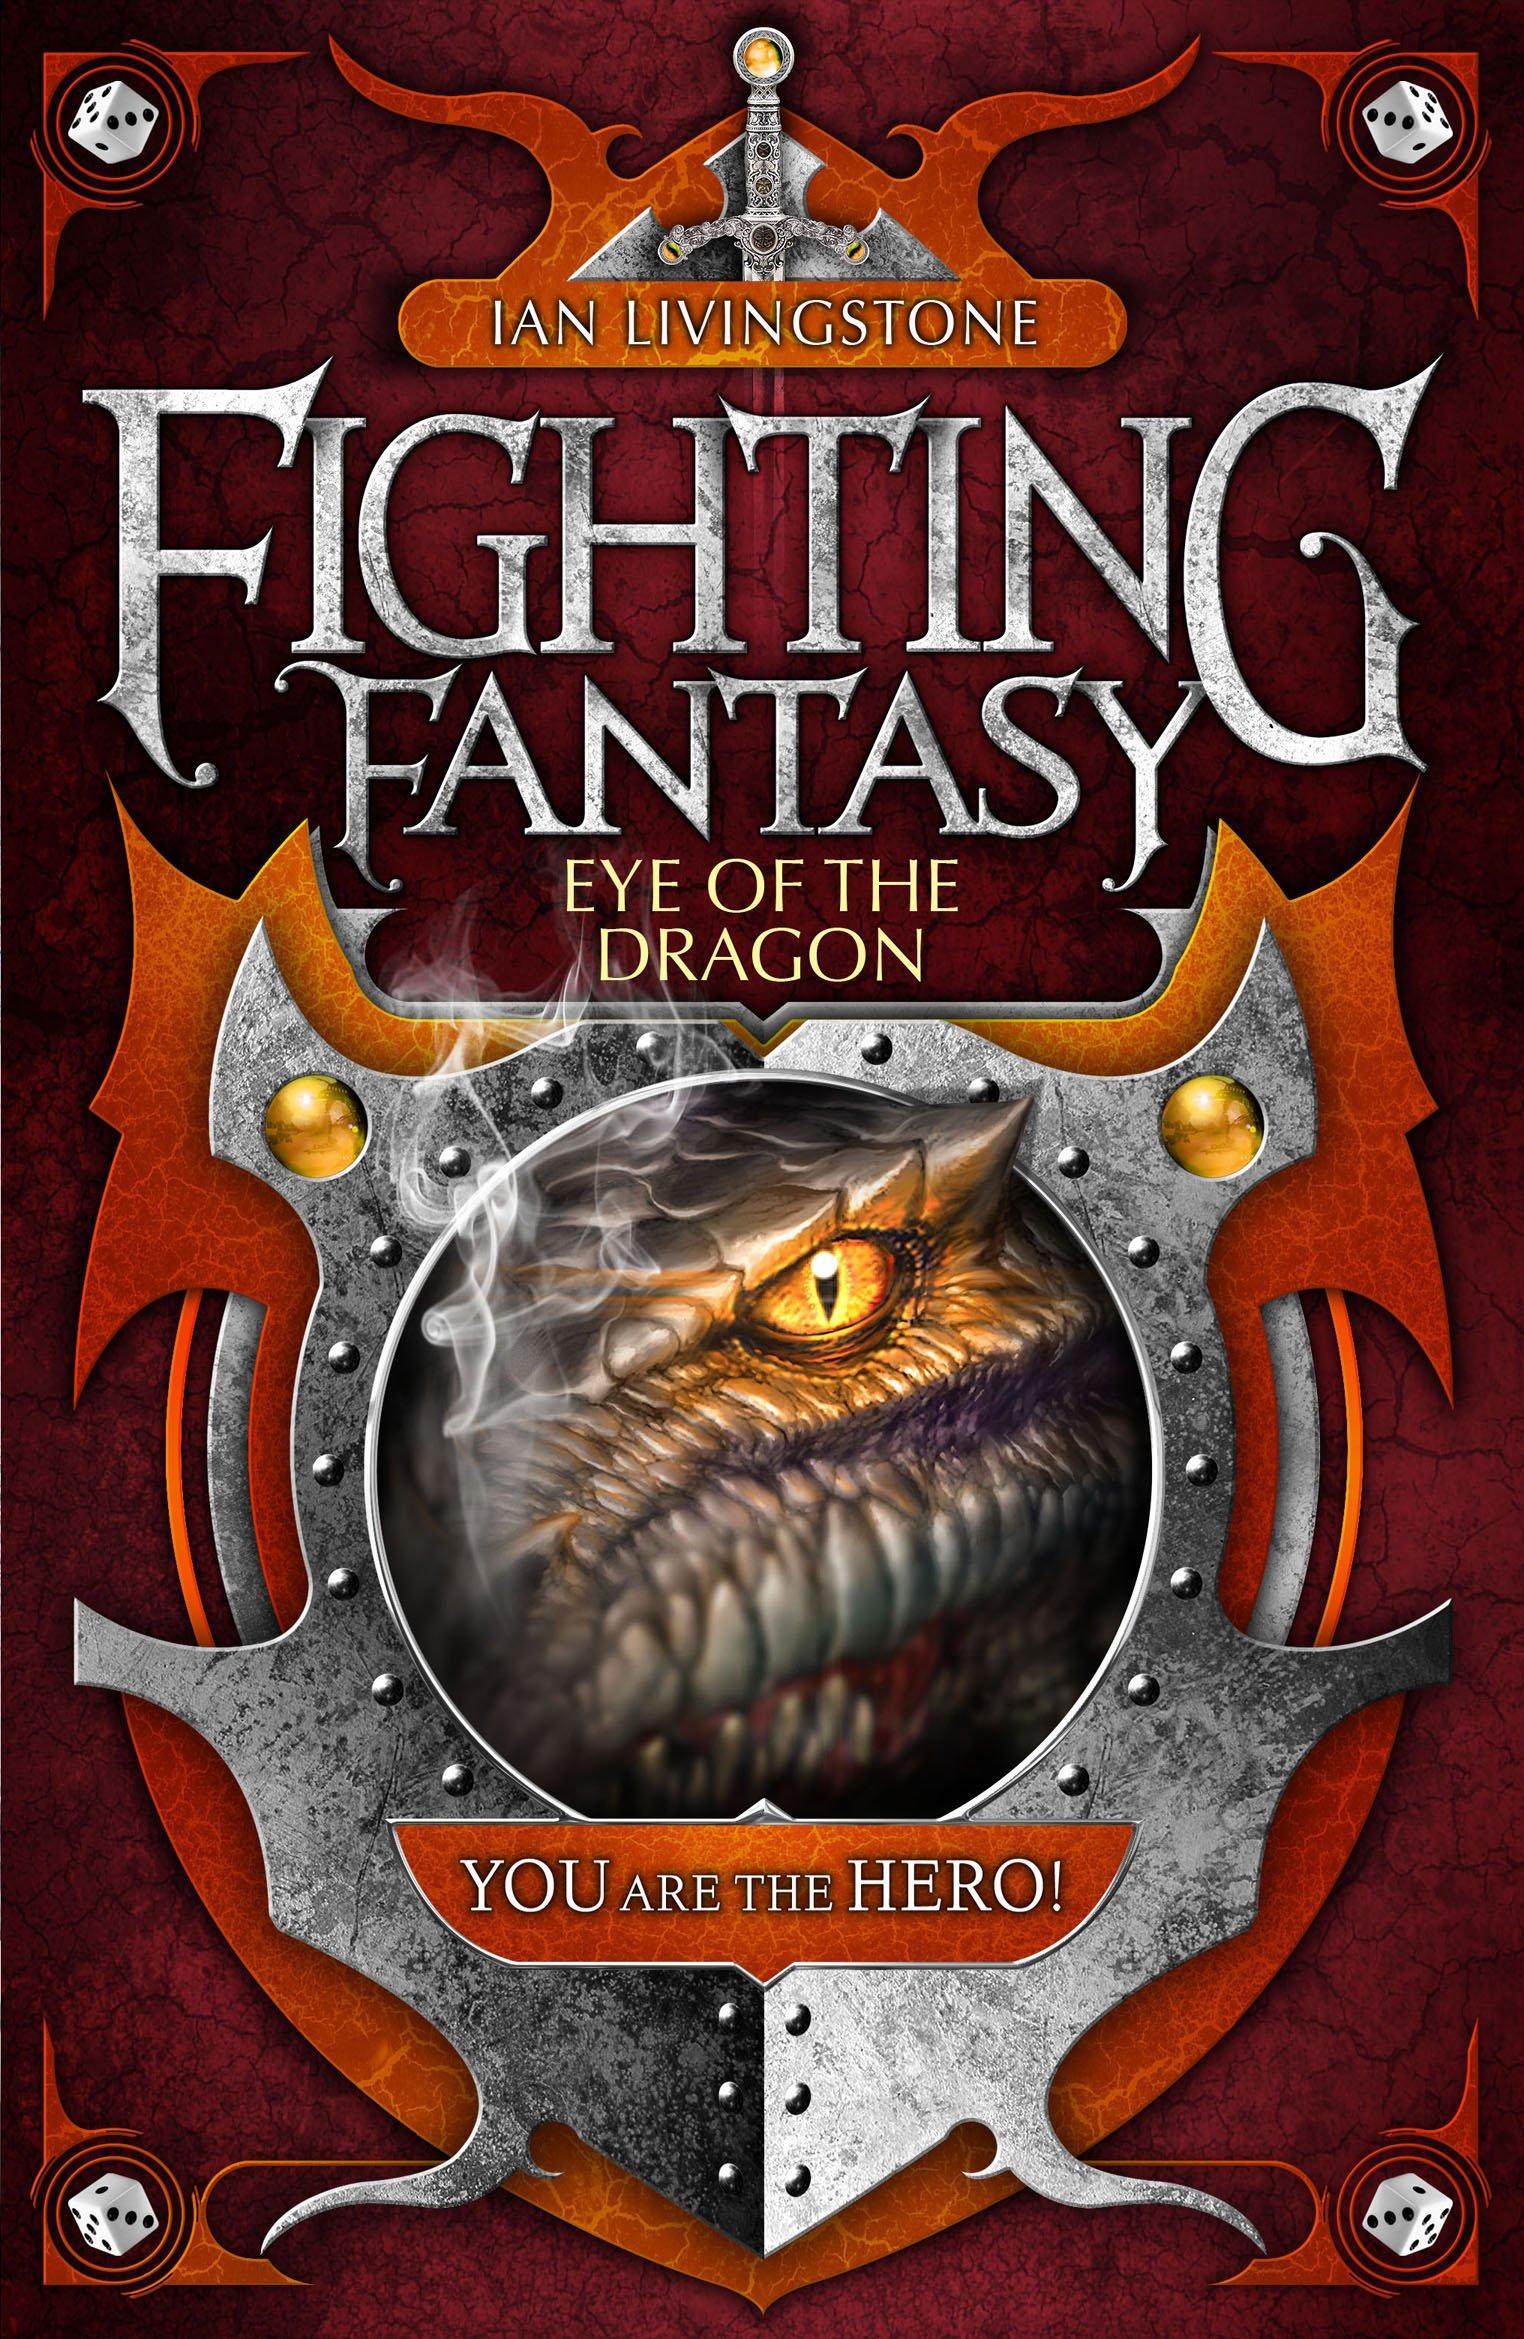 Read Online Eye of the Dragon (Fighting Fantasy) pdf epub